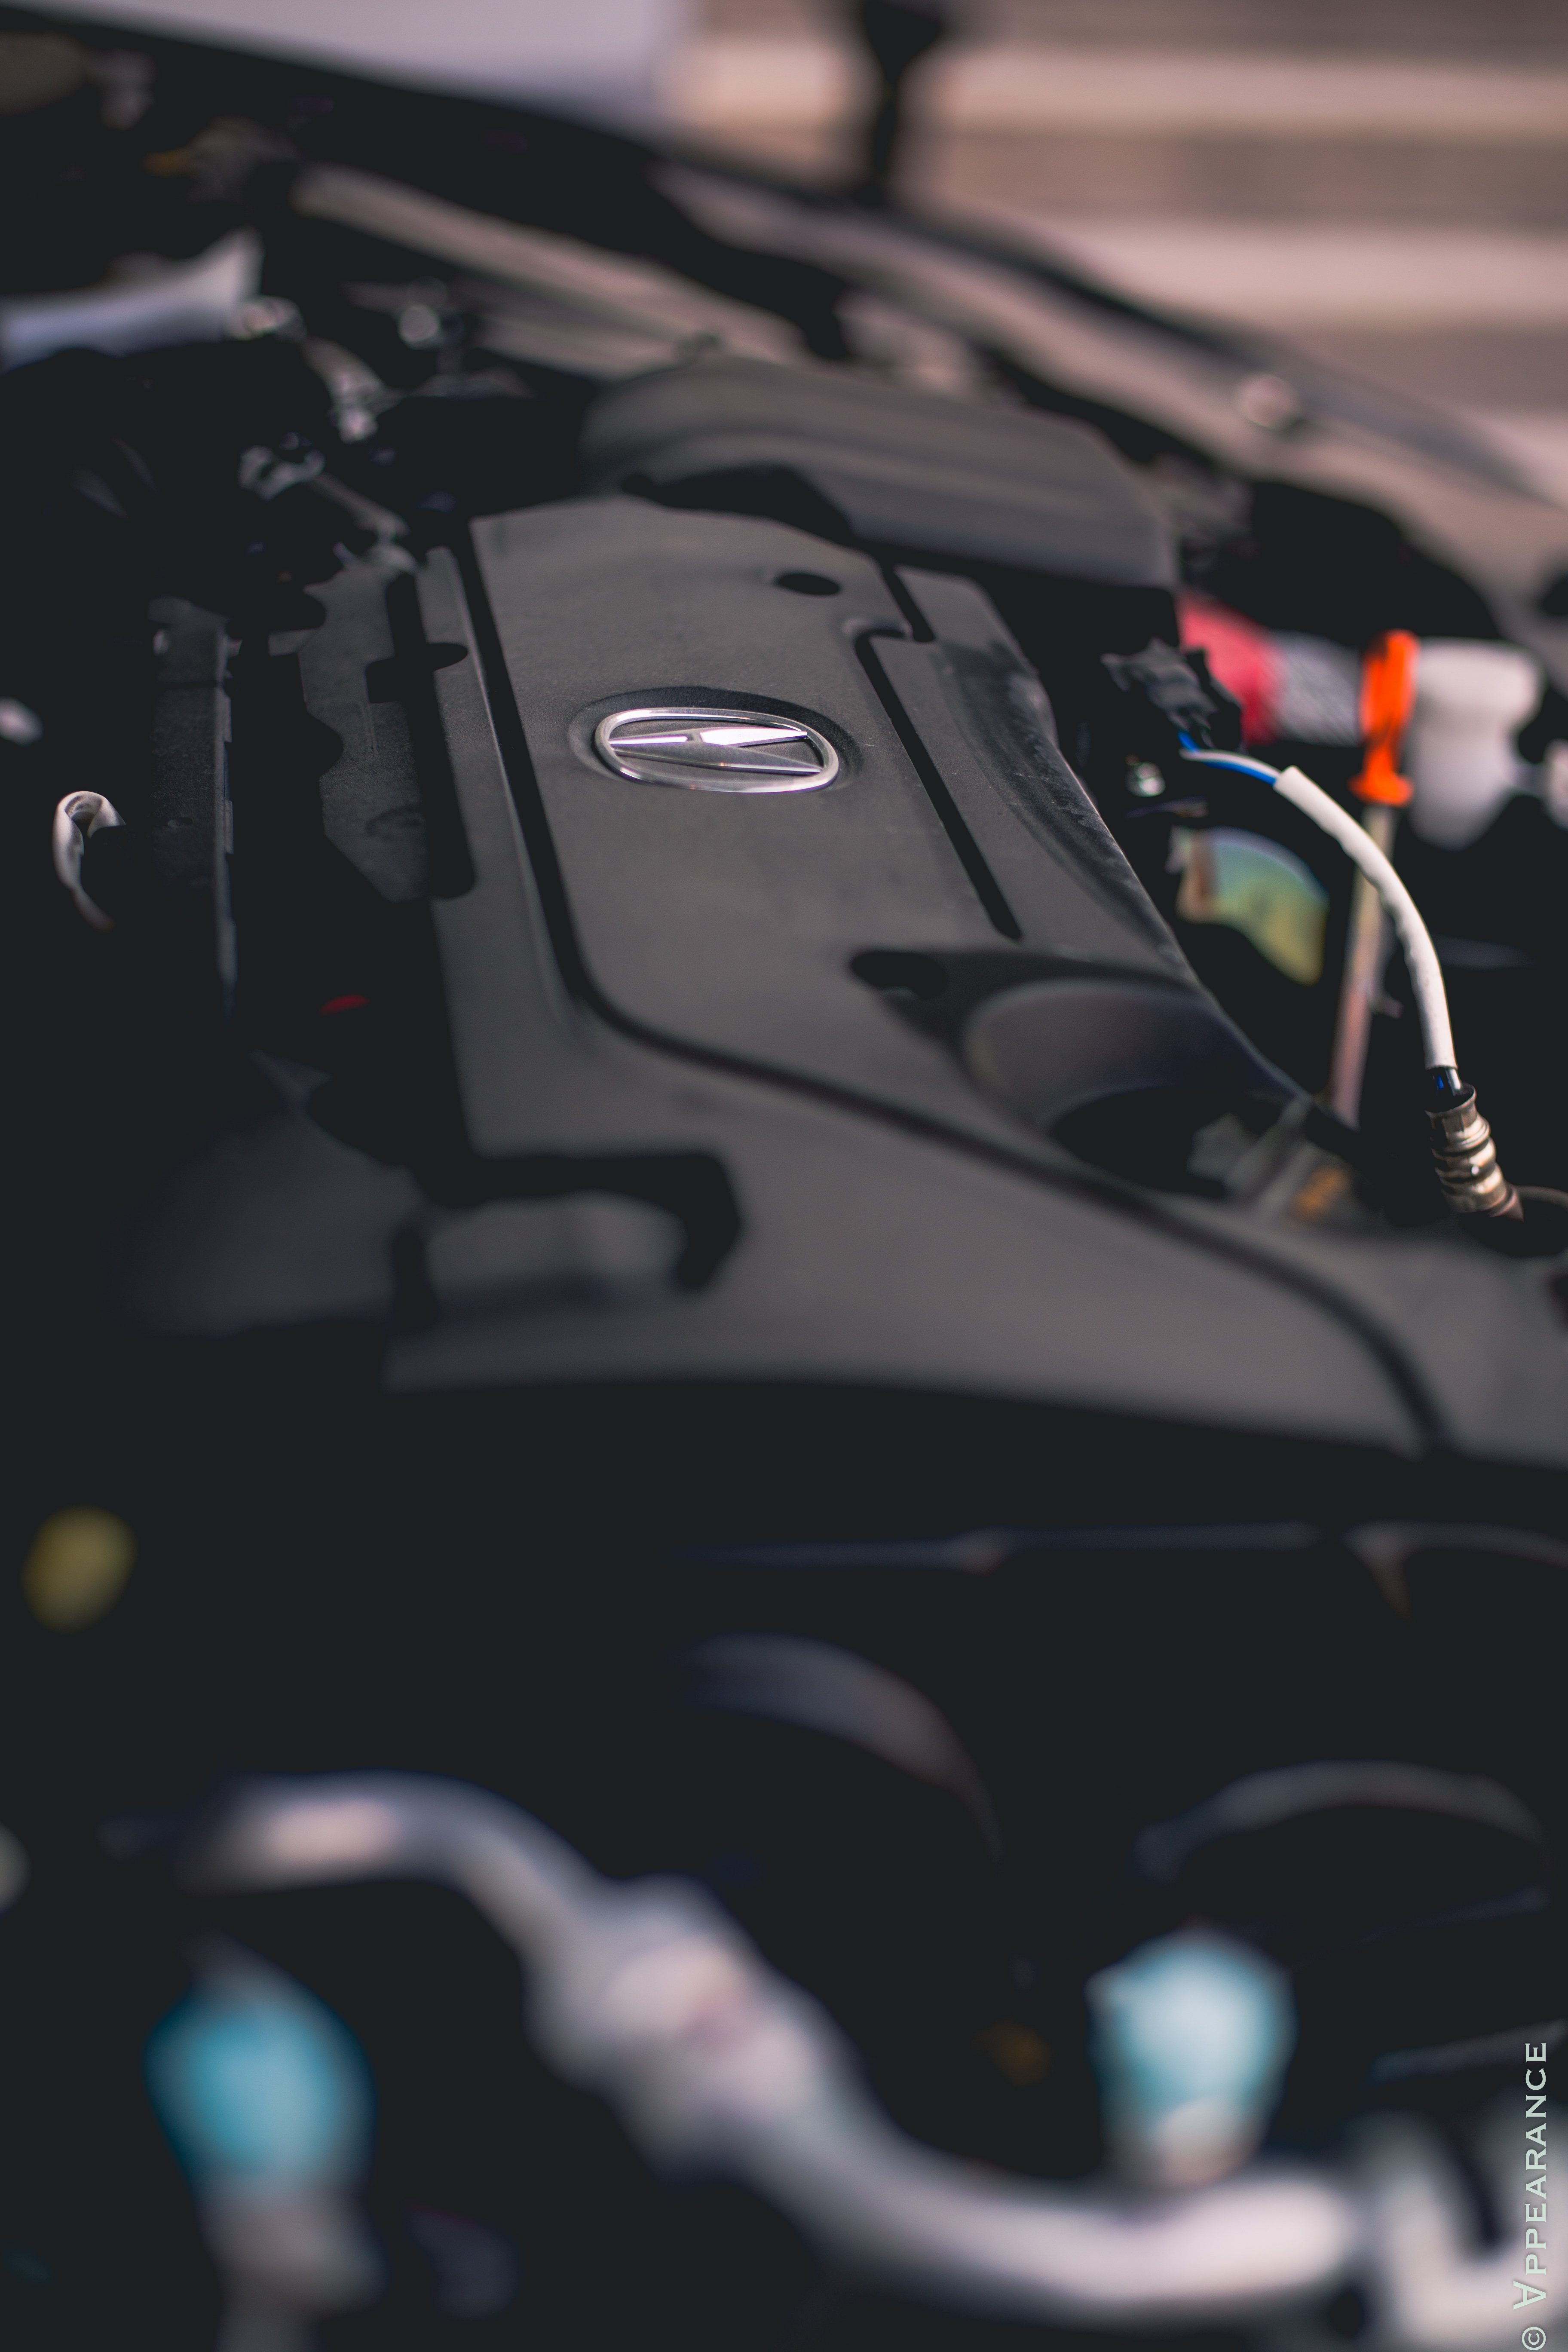 2017 Acura ILX Comprehensive Review | Clavey's Corner